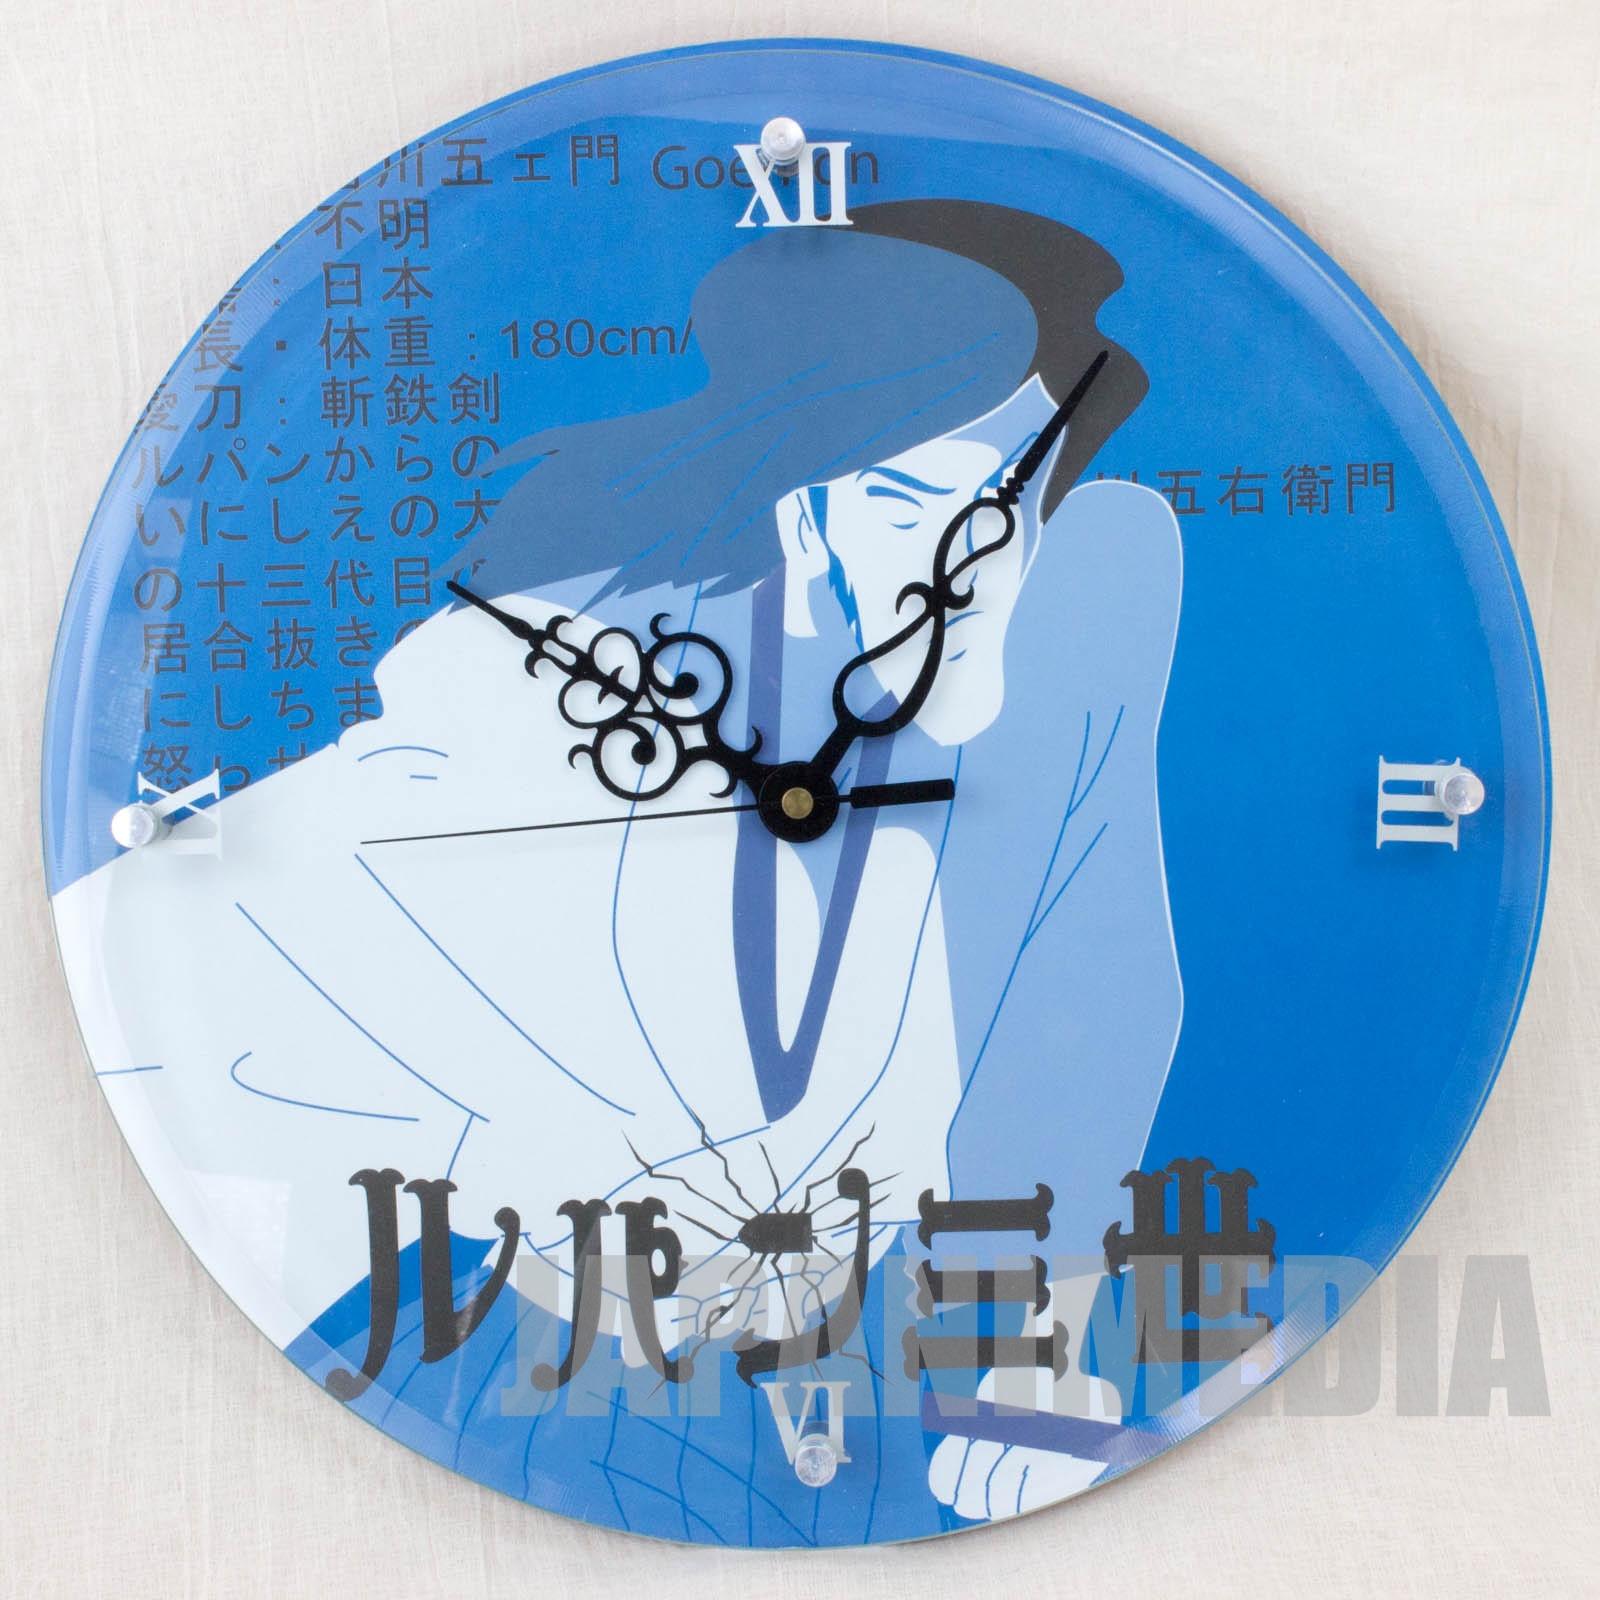 RARE!! Lupin the Third (3rd) Goemon Ishikawa Wall clock JAPAN ANIME